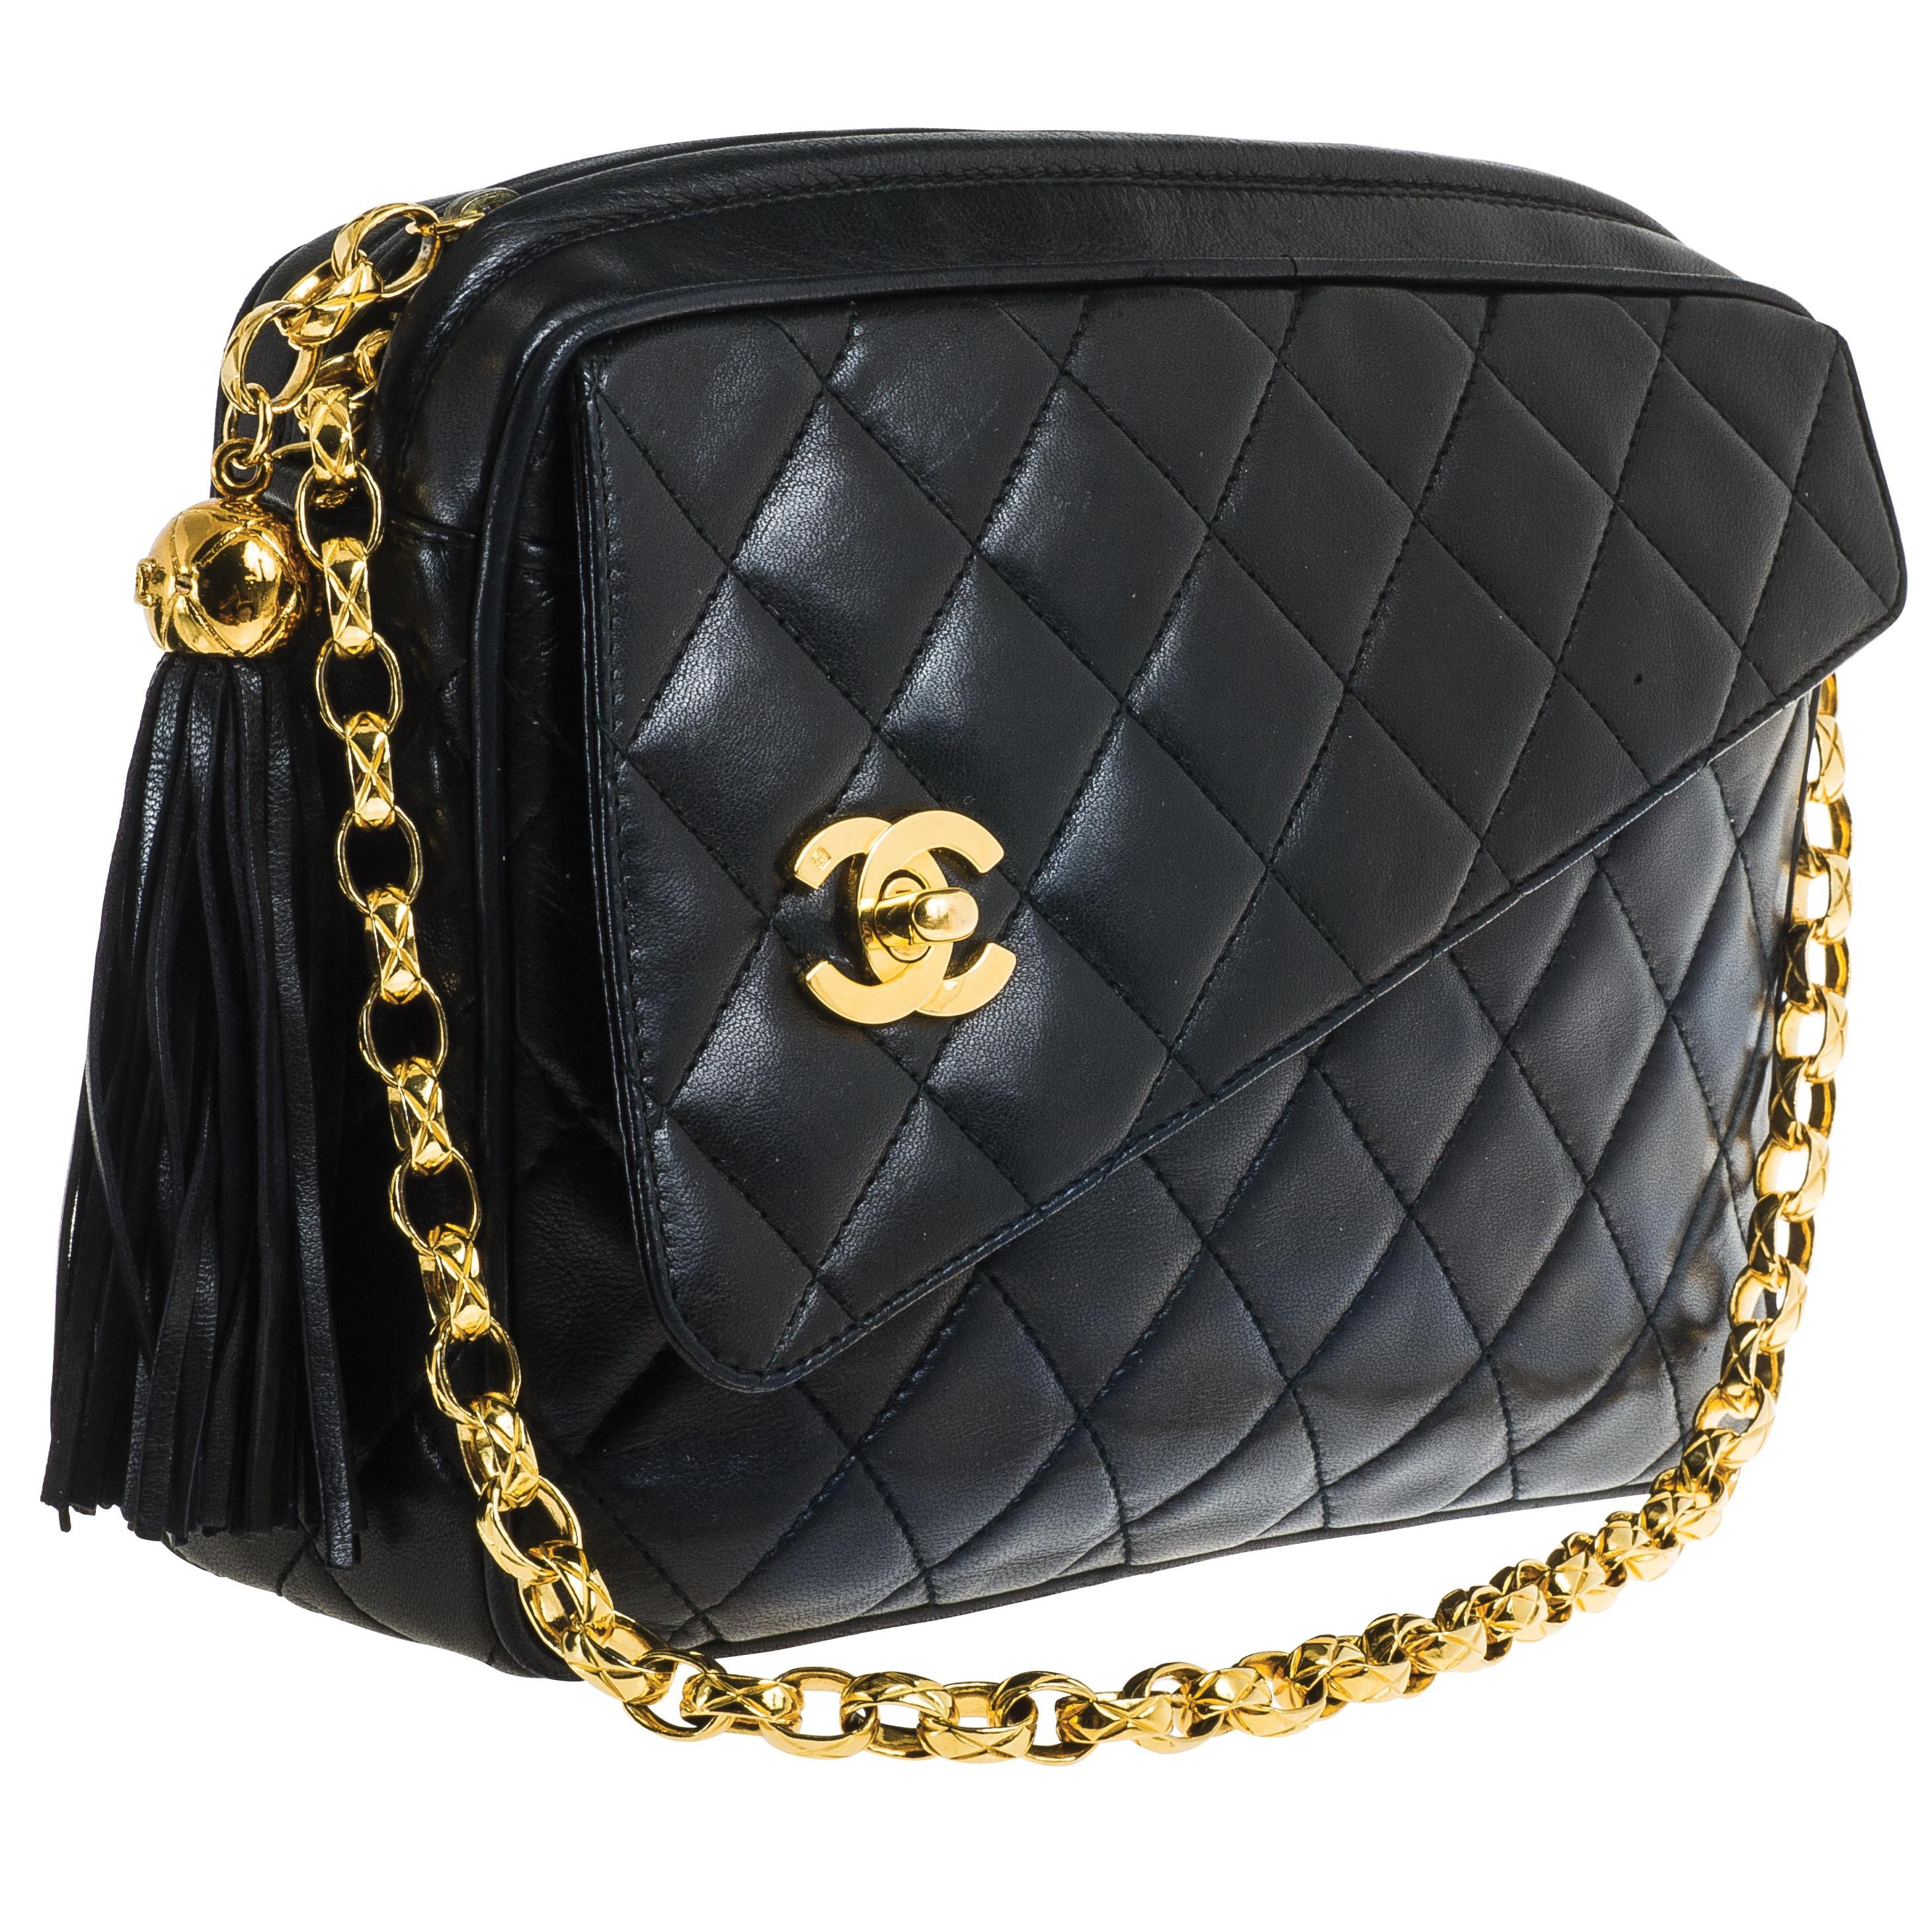 Vintage Chanel Quilted Camera Handbag